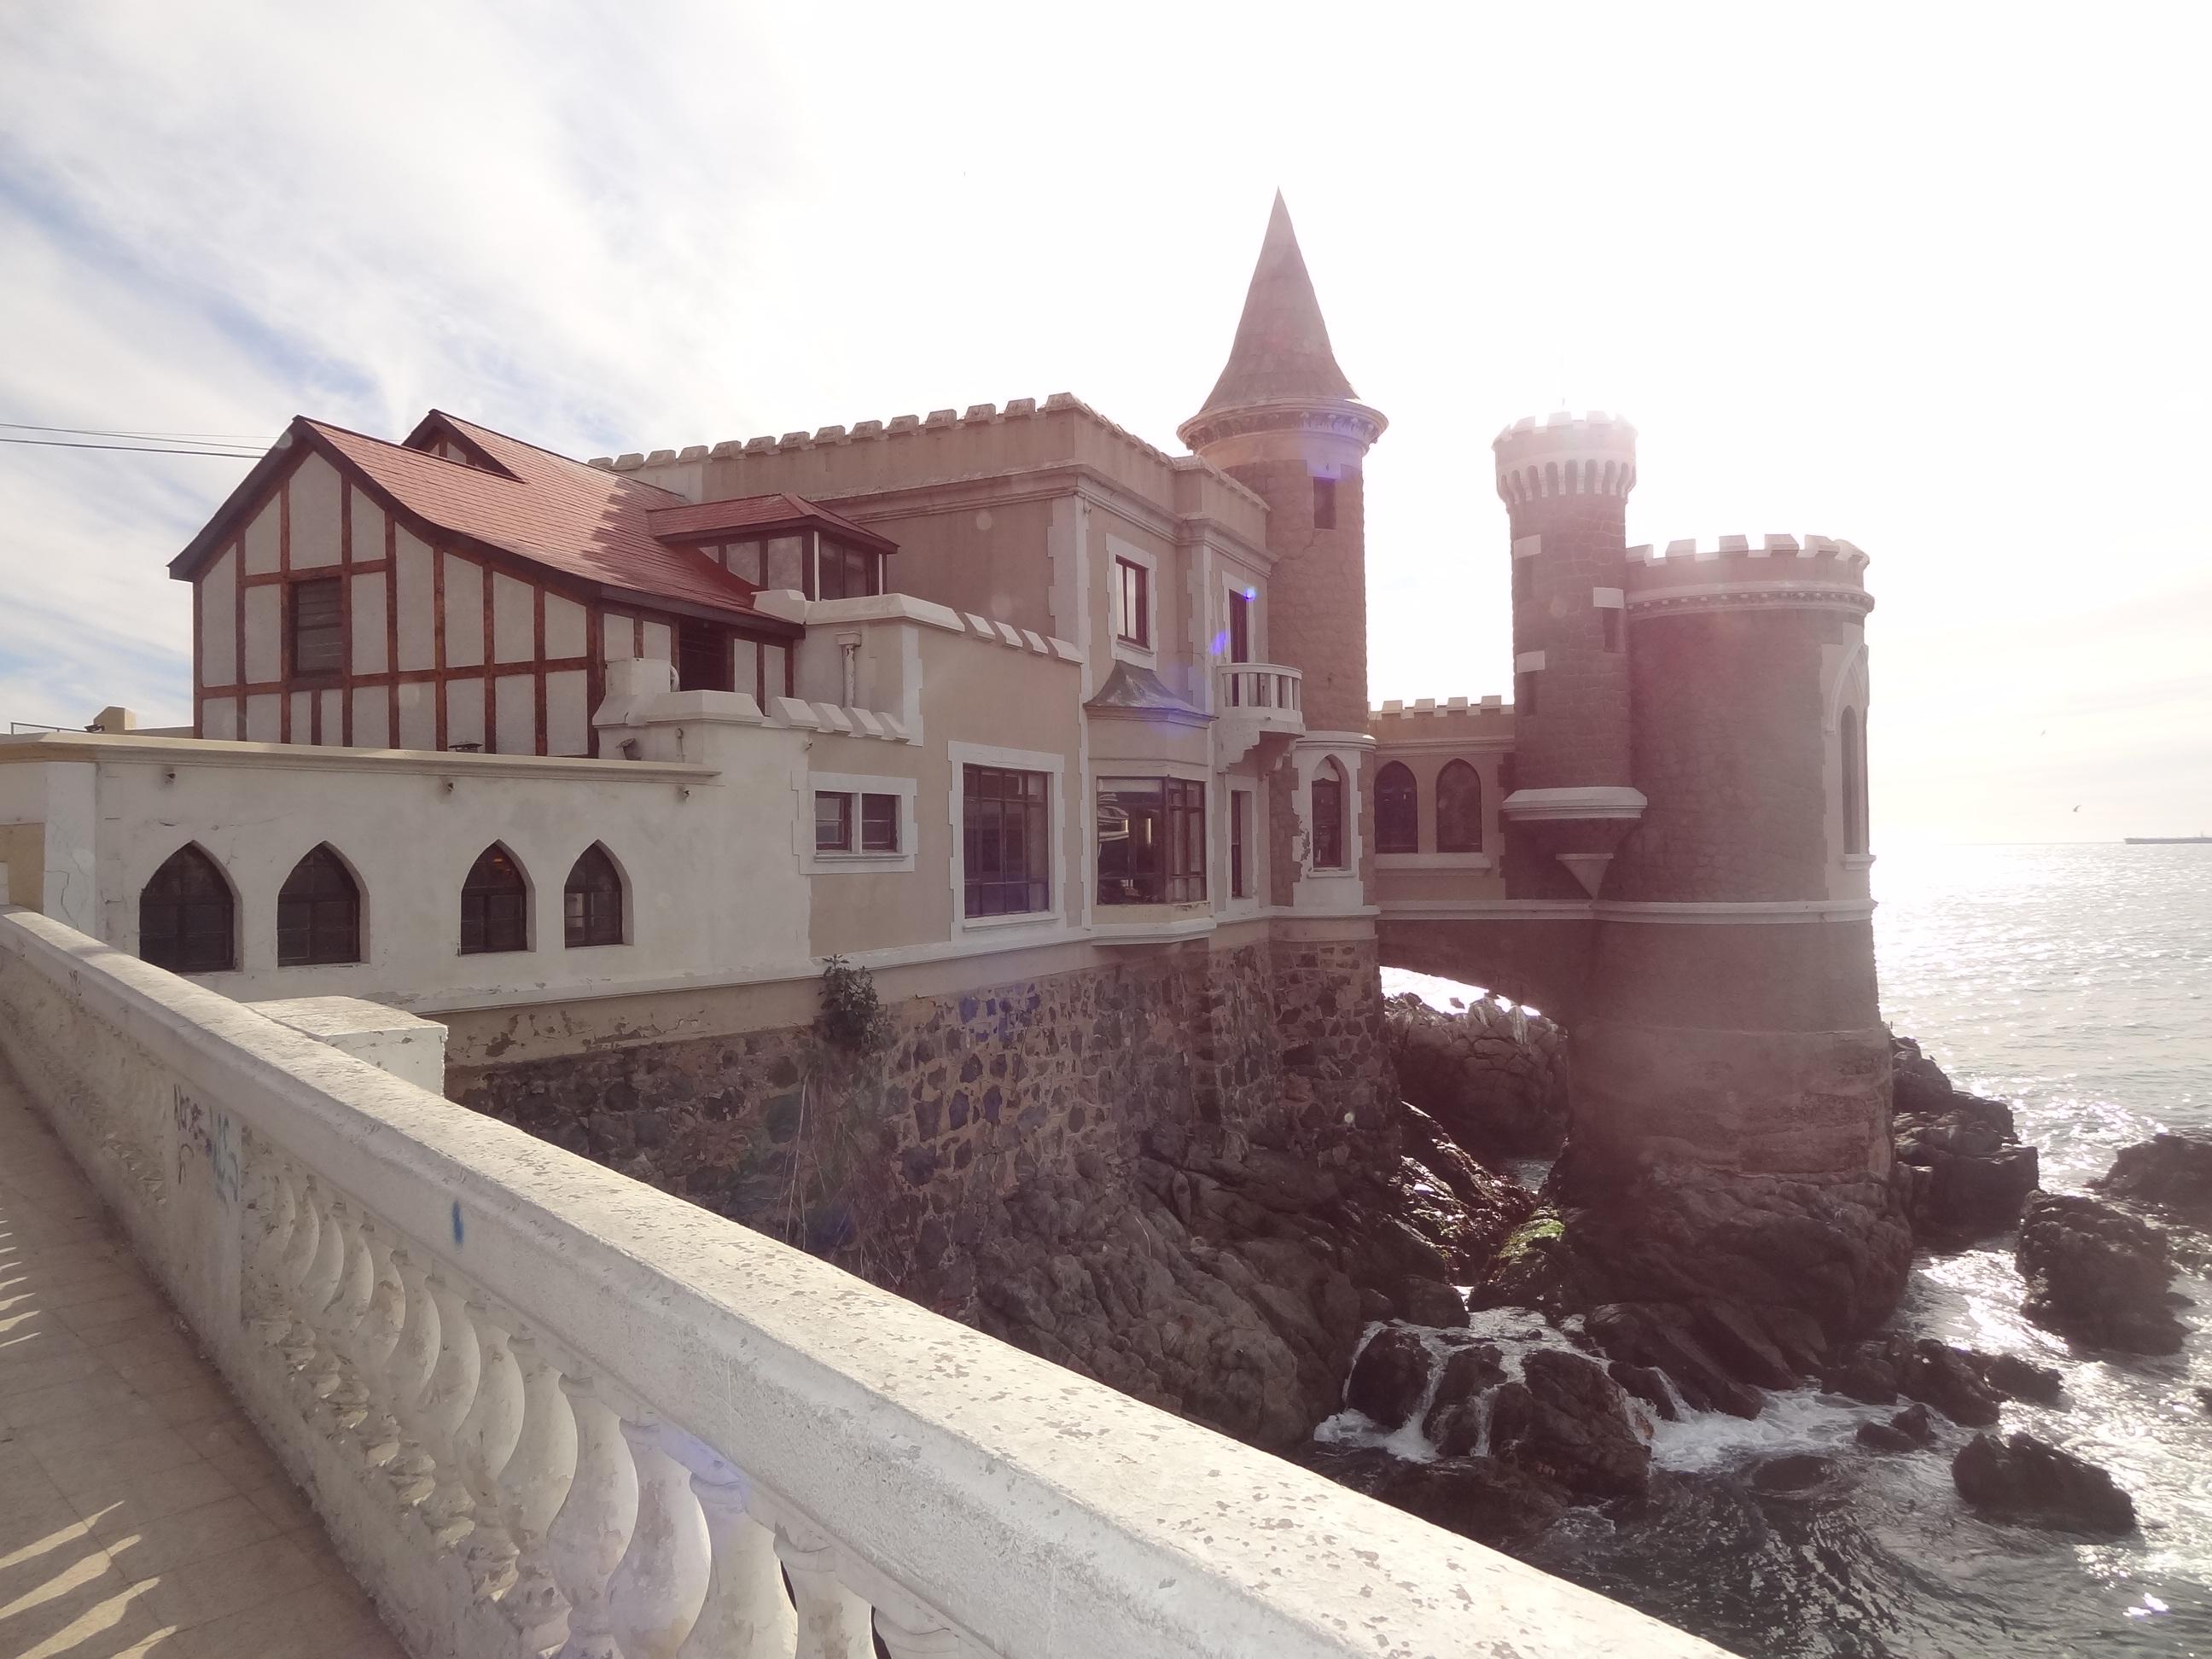 roteiro-santiago-7-a-10-dias-castelo-wulf Roteiro Santiago 7 a 10 dias (Completíssimo)